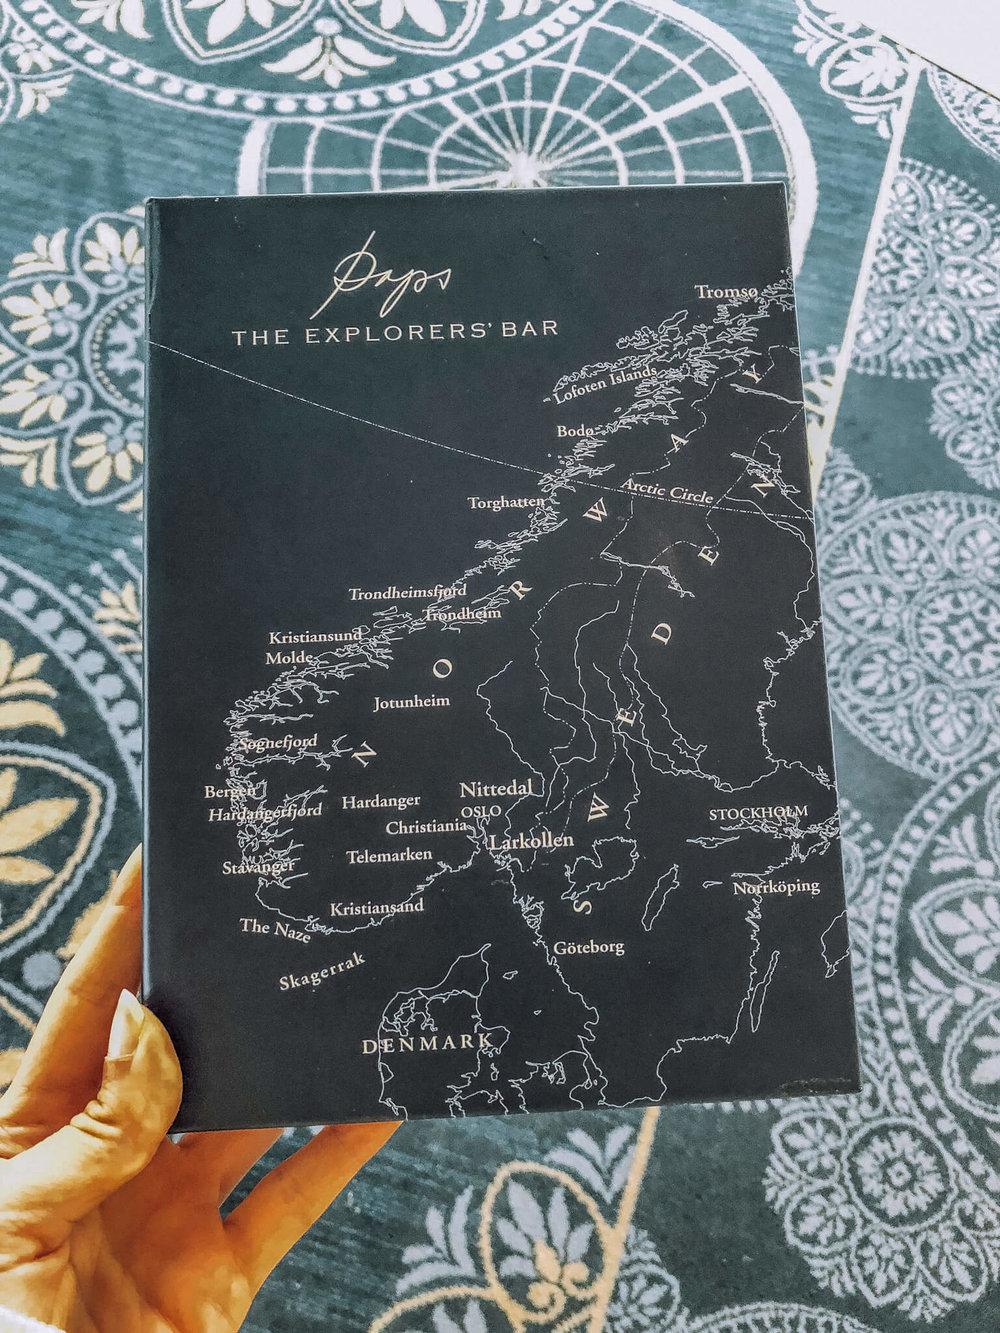 viking explorers bar